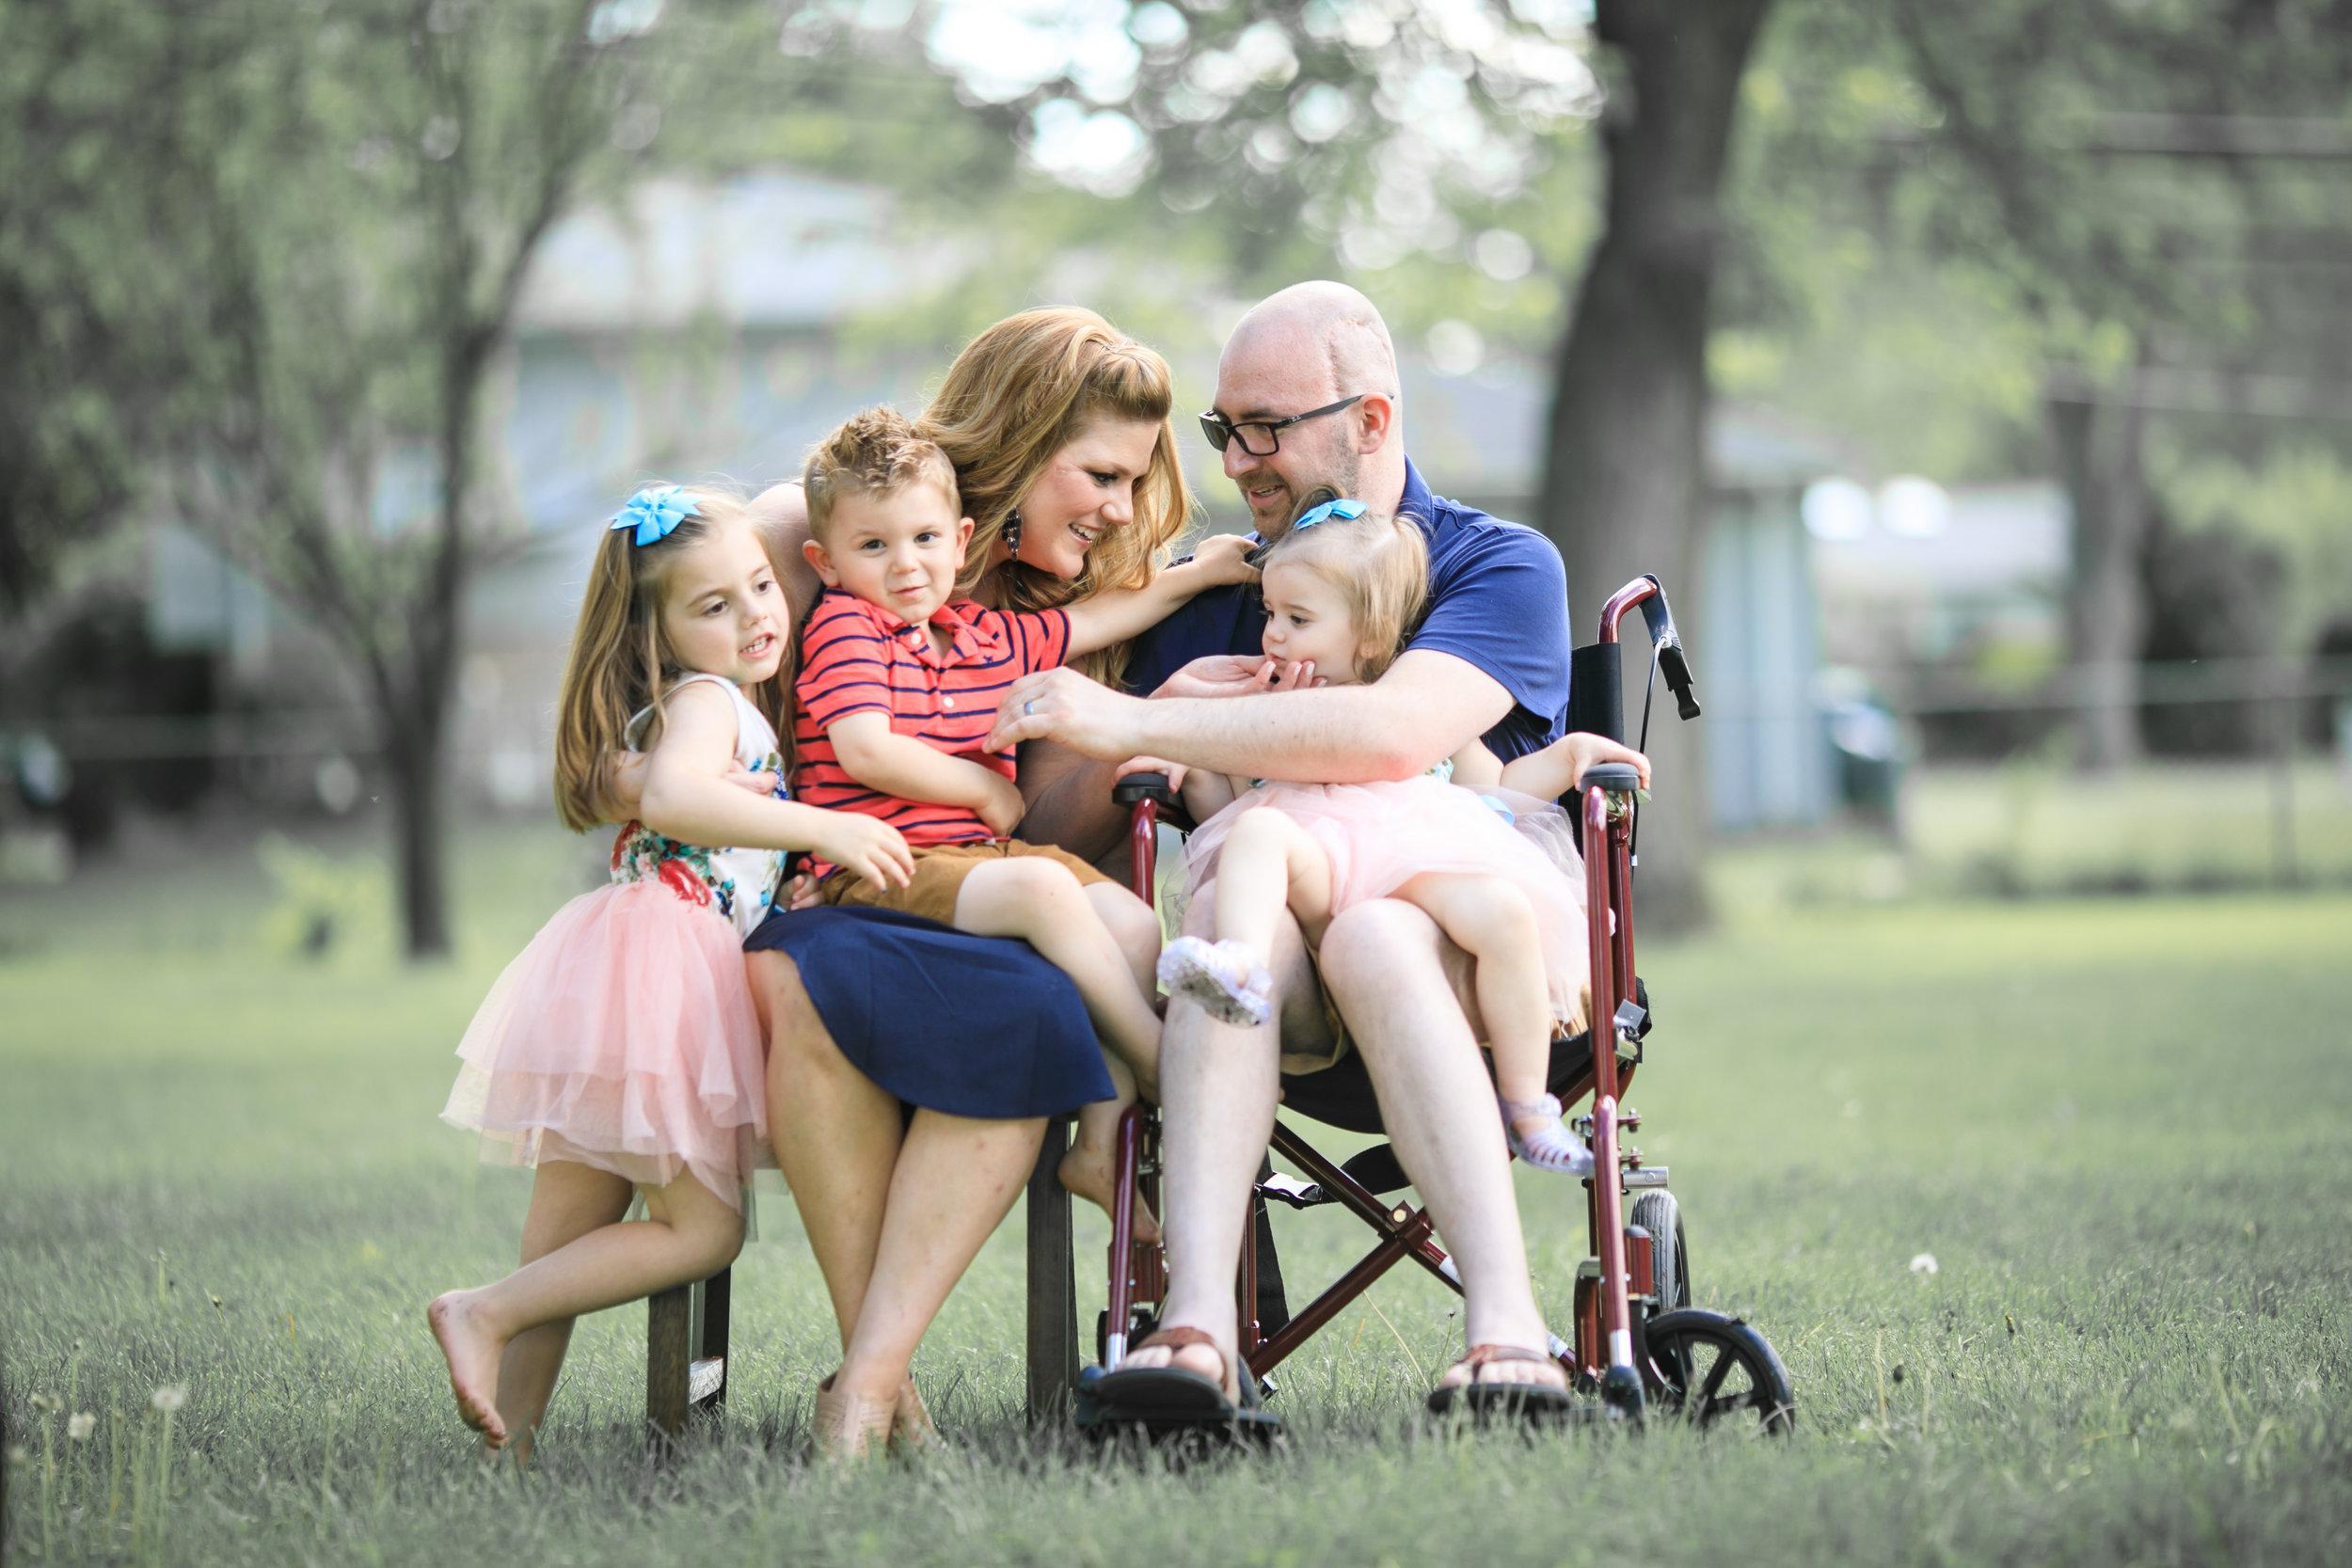 Dan-coghlan-terminally-ill-photographs-brain-cancer13.jpg